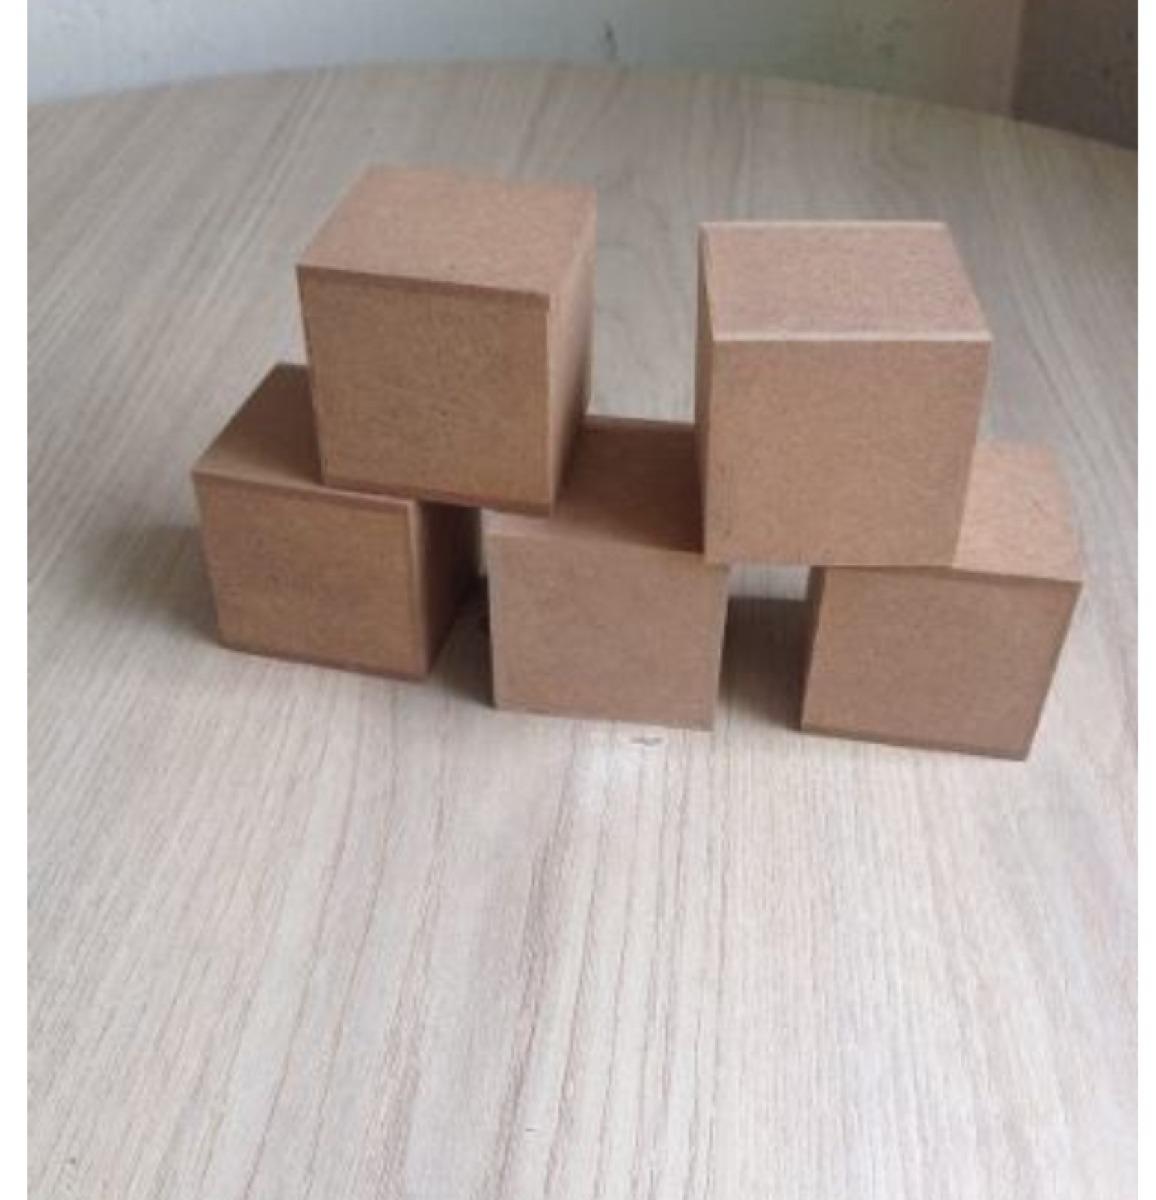 Cubo 7x7 Em Mdf Cru R$ 3 50 no MercadoLivre #45322A 1156x1200